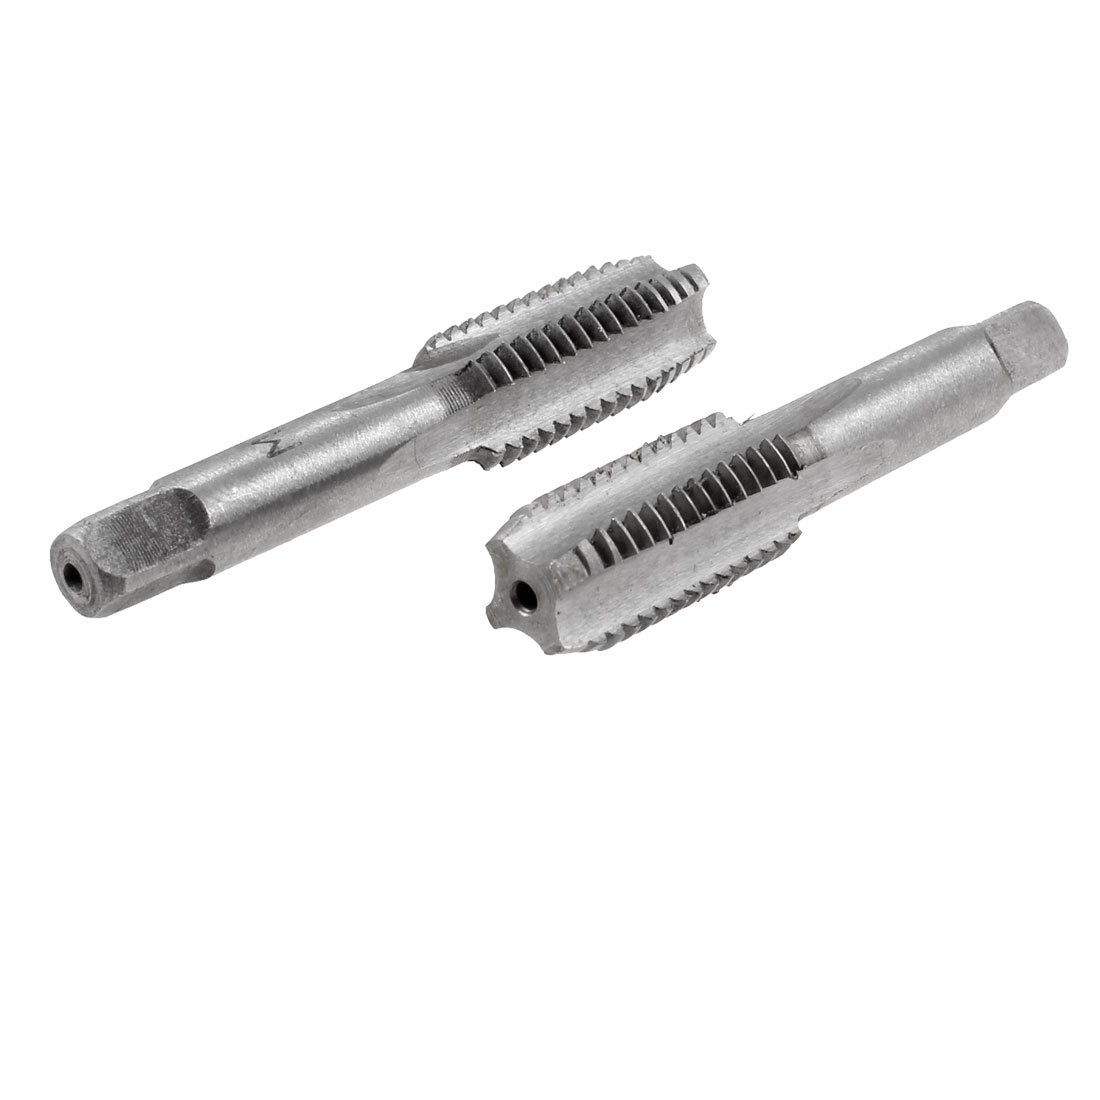 2 Pcs M14 14mm High Speed Steel HSS Hand Screw Thread Metric Taps